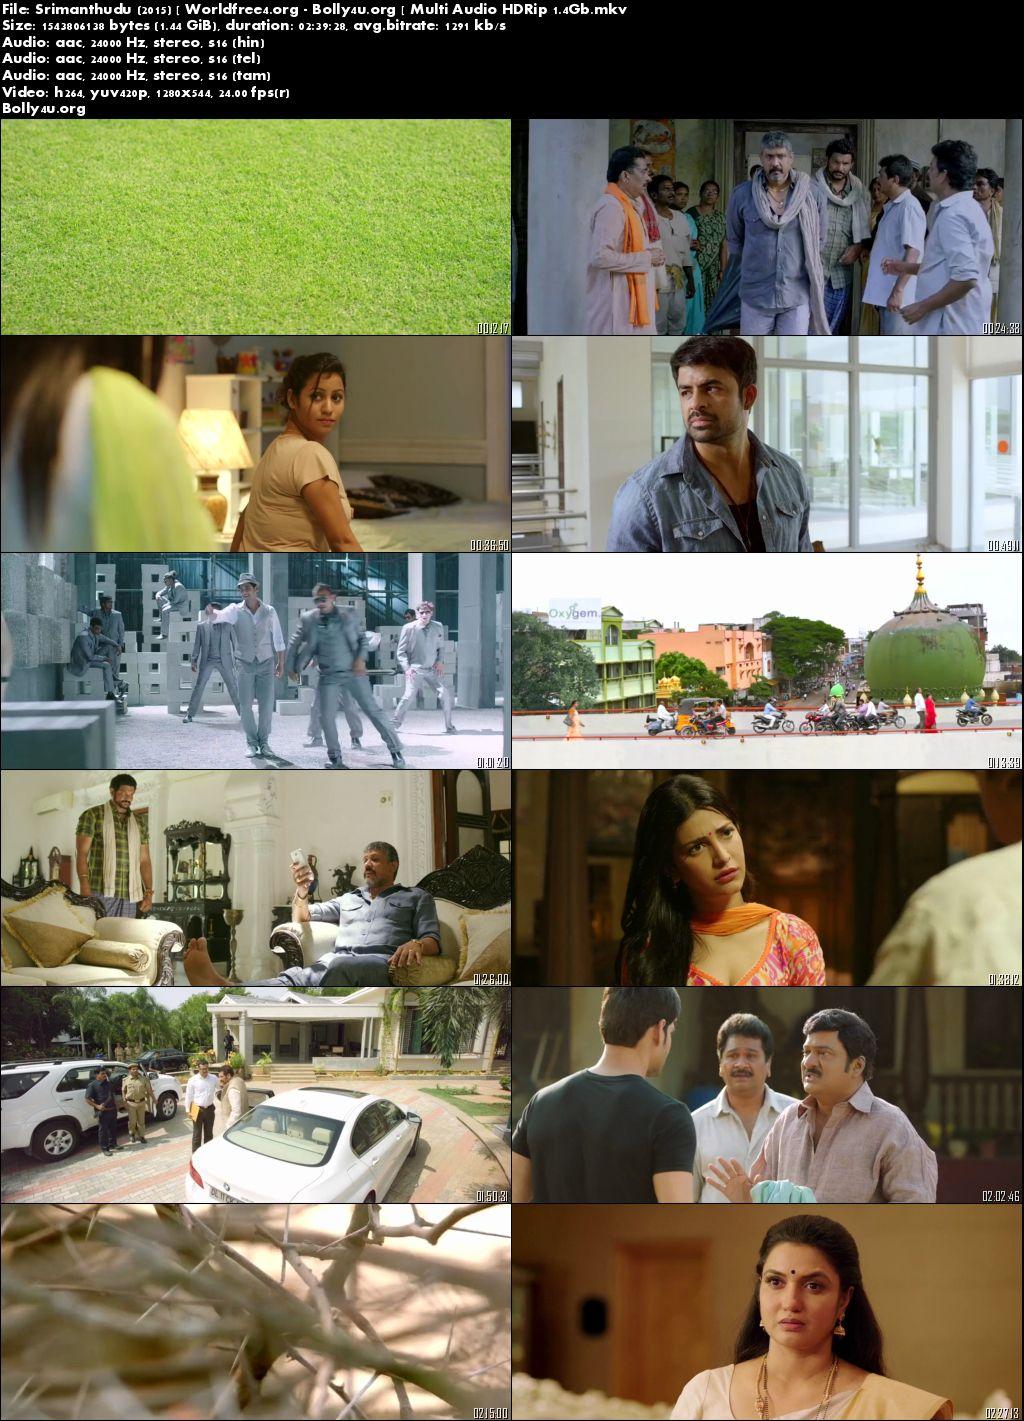 Srimanthudu 2015 HDRip 1.4Gb Hindi Multi Audio 720p